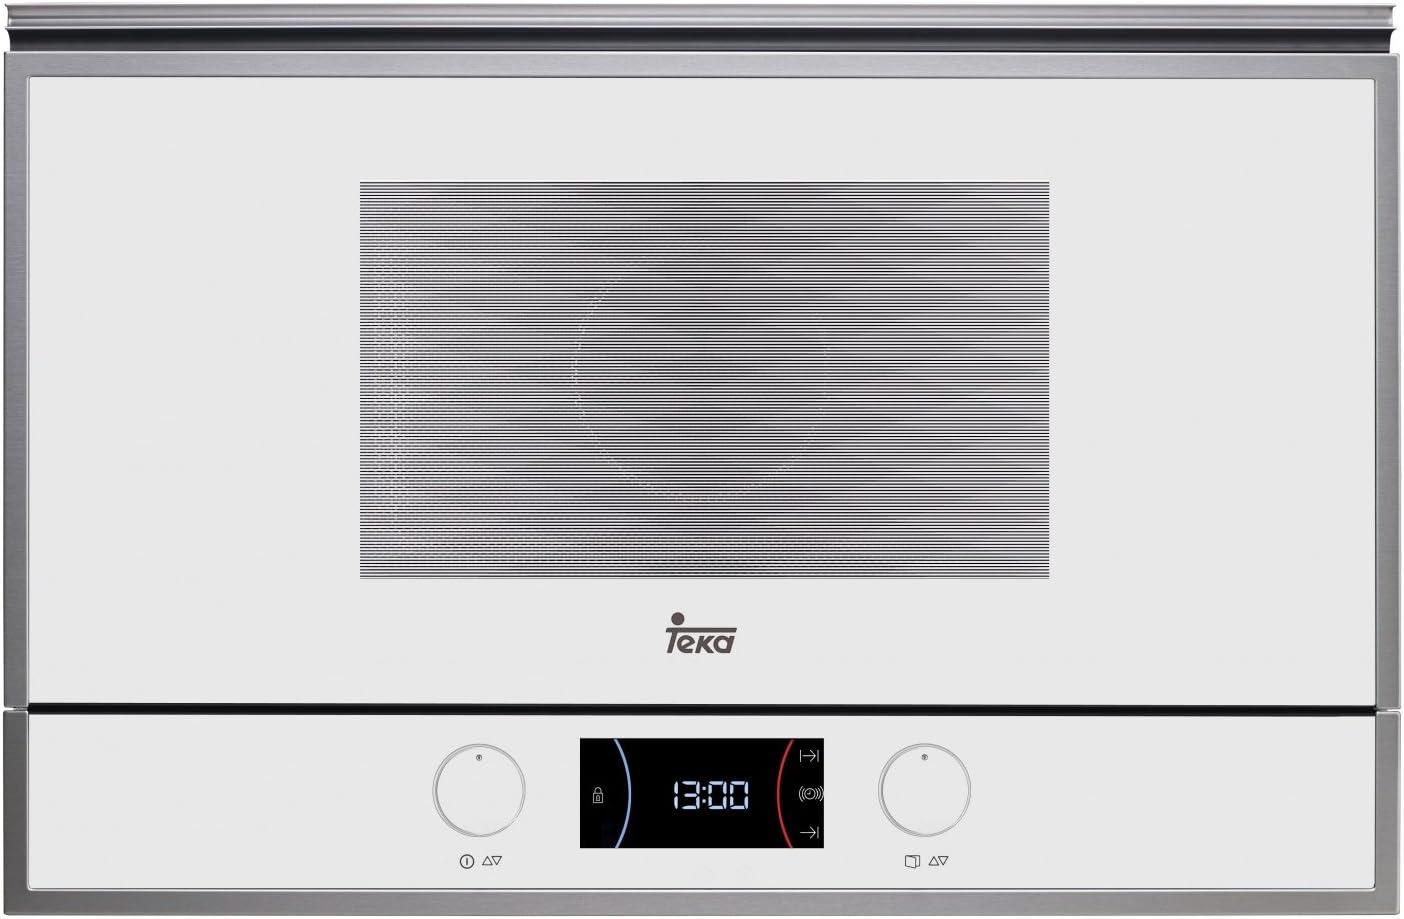 Teka ML 822 bis Microondas con grill, 2500 W, 22 litros, Otro, BLANCO